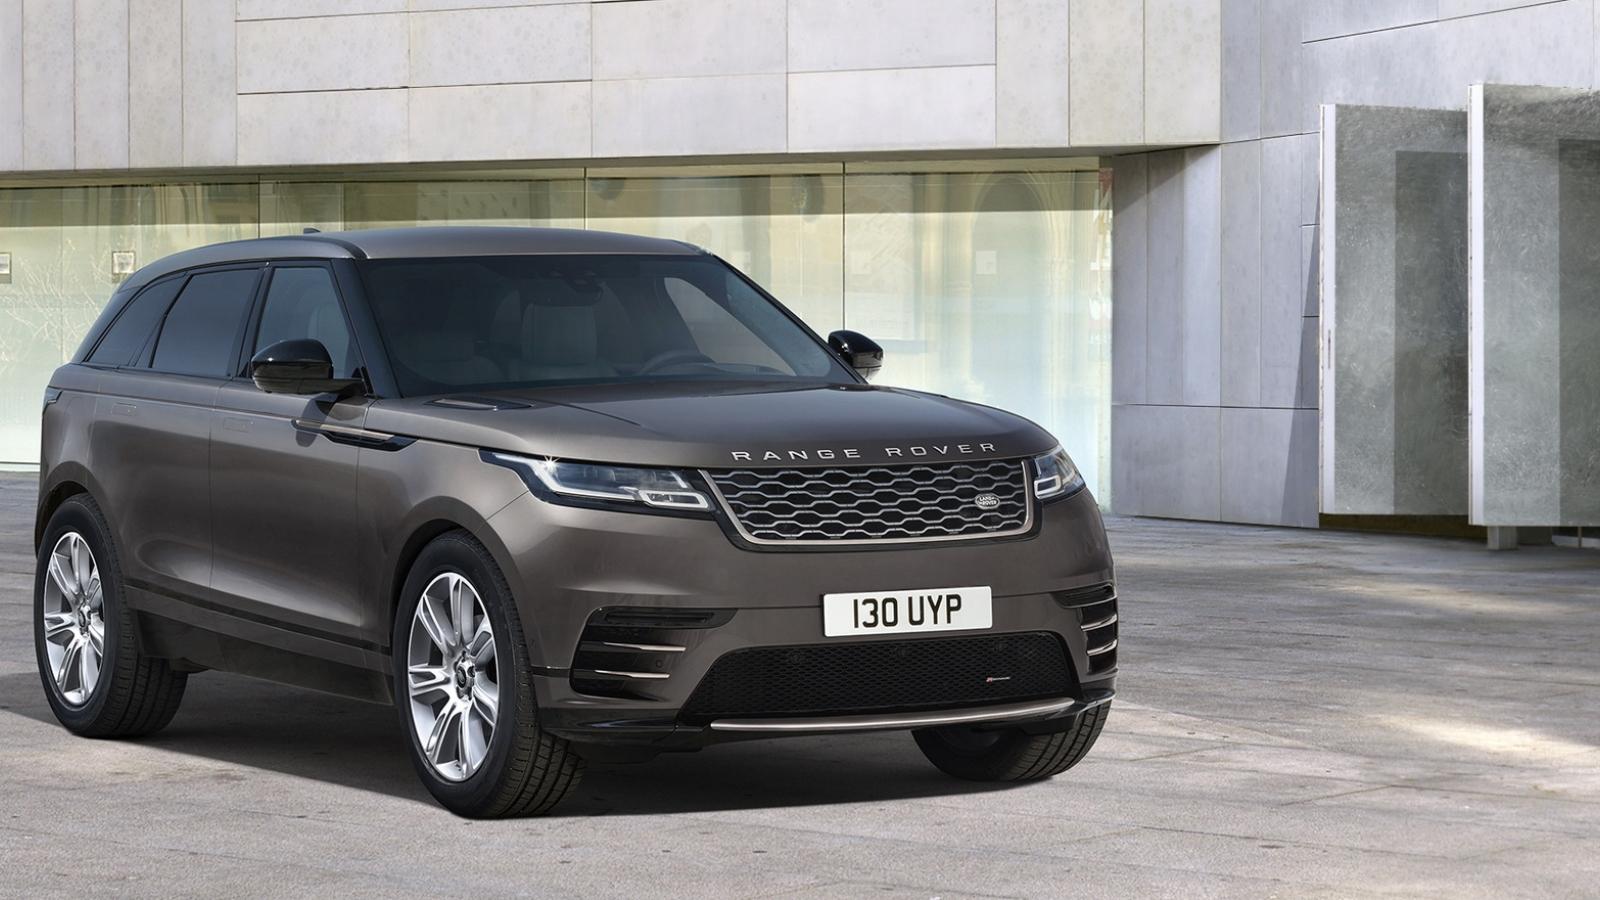 Lộ diện Land Rover Range Rover Velar 2022 bản nâng cấp